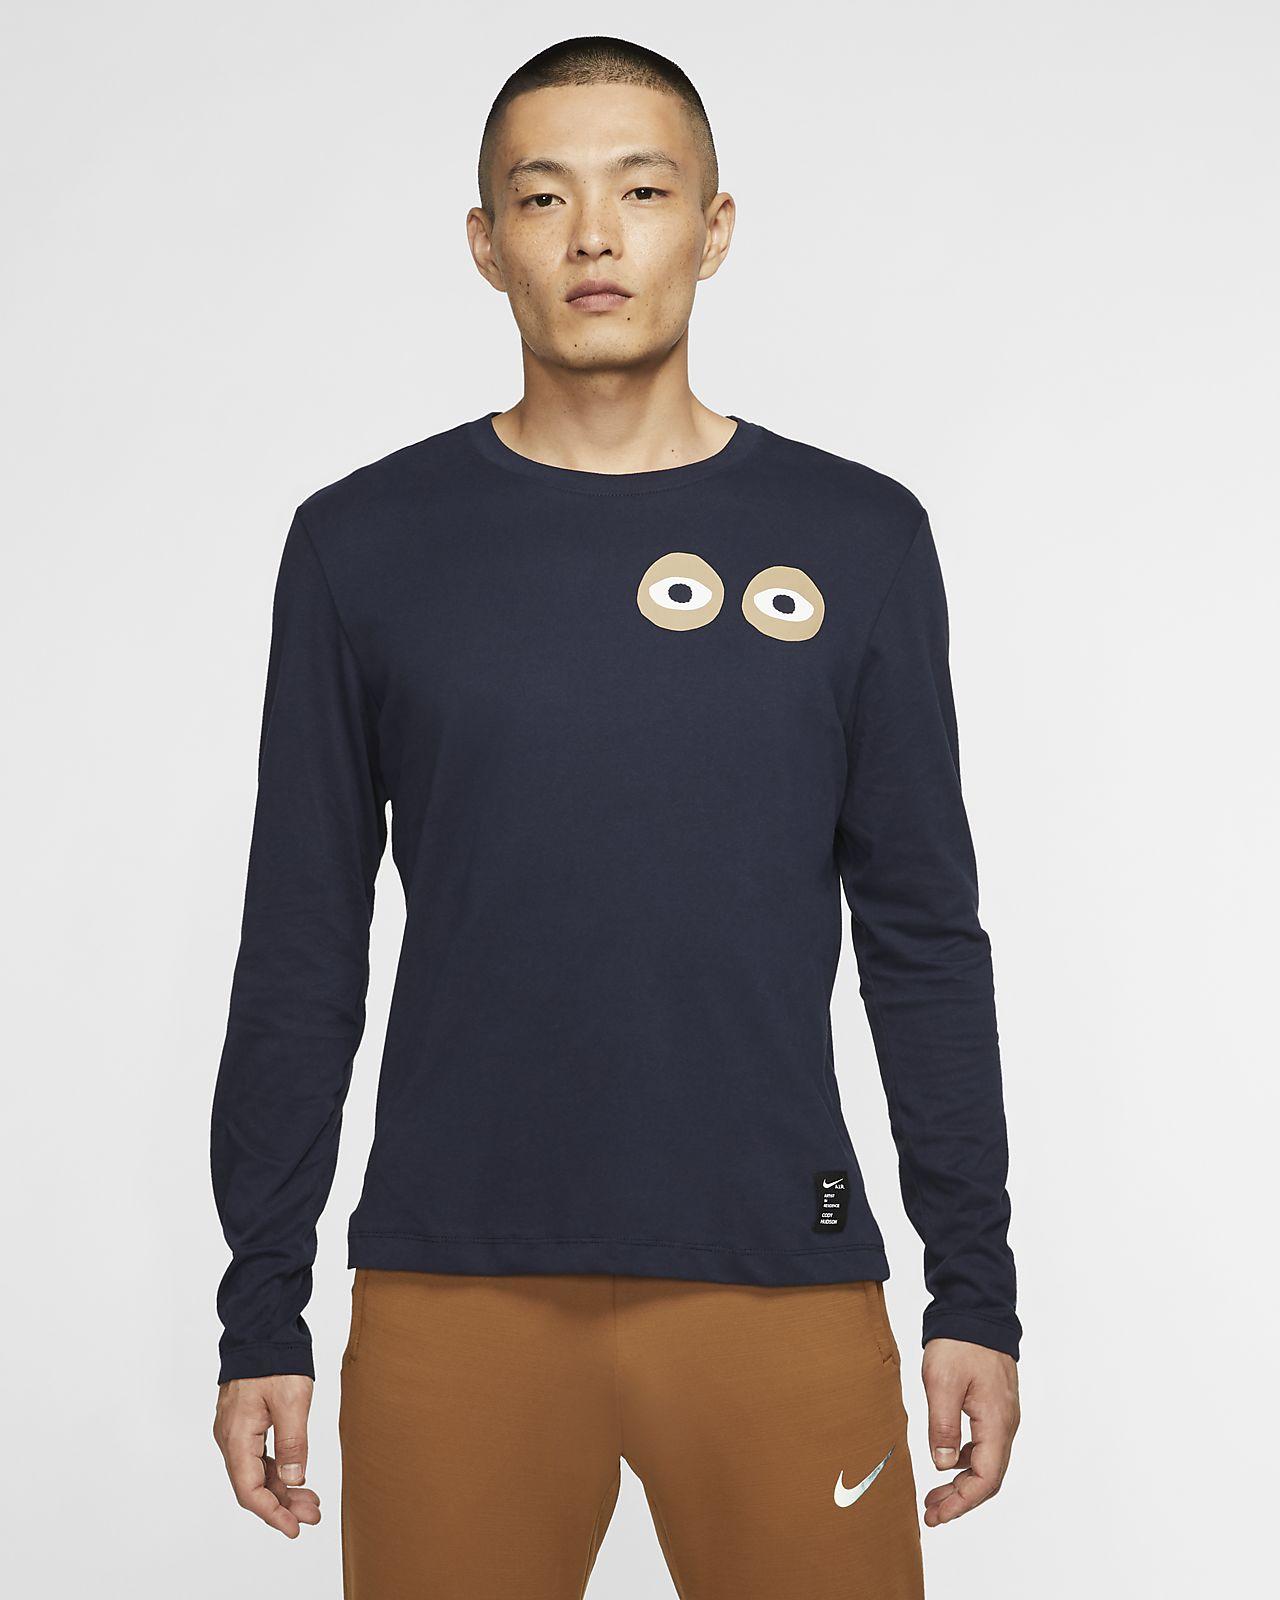 t-shirt manche longue nike homme